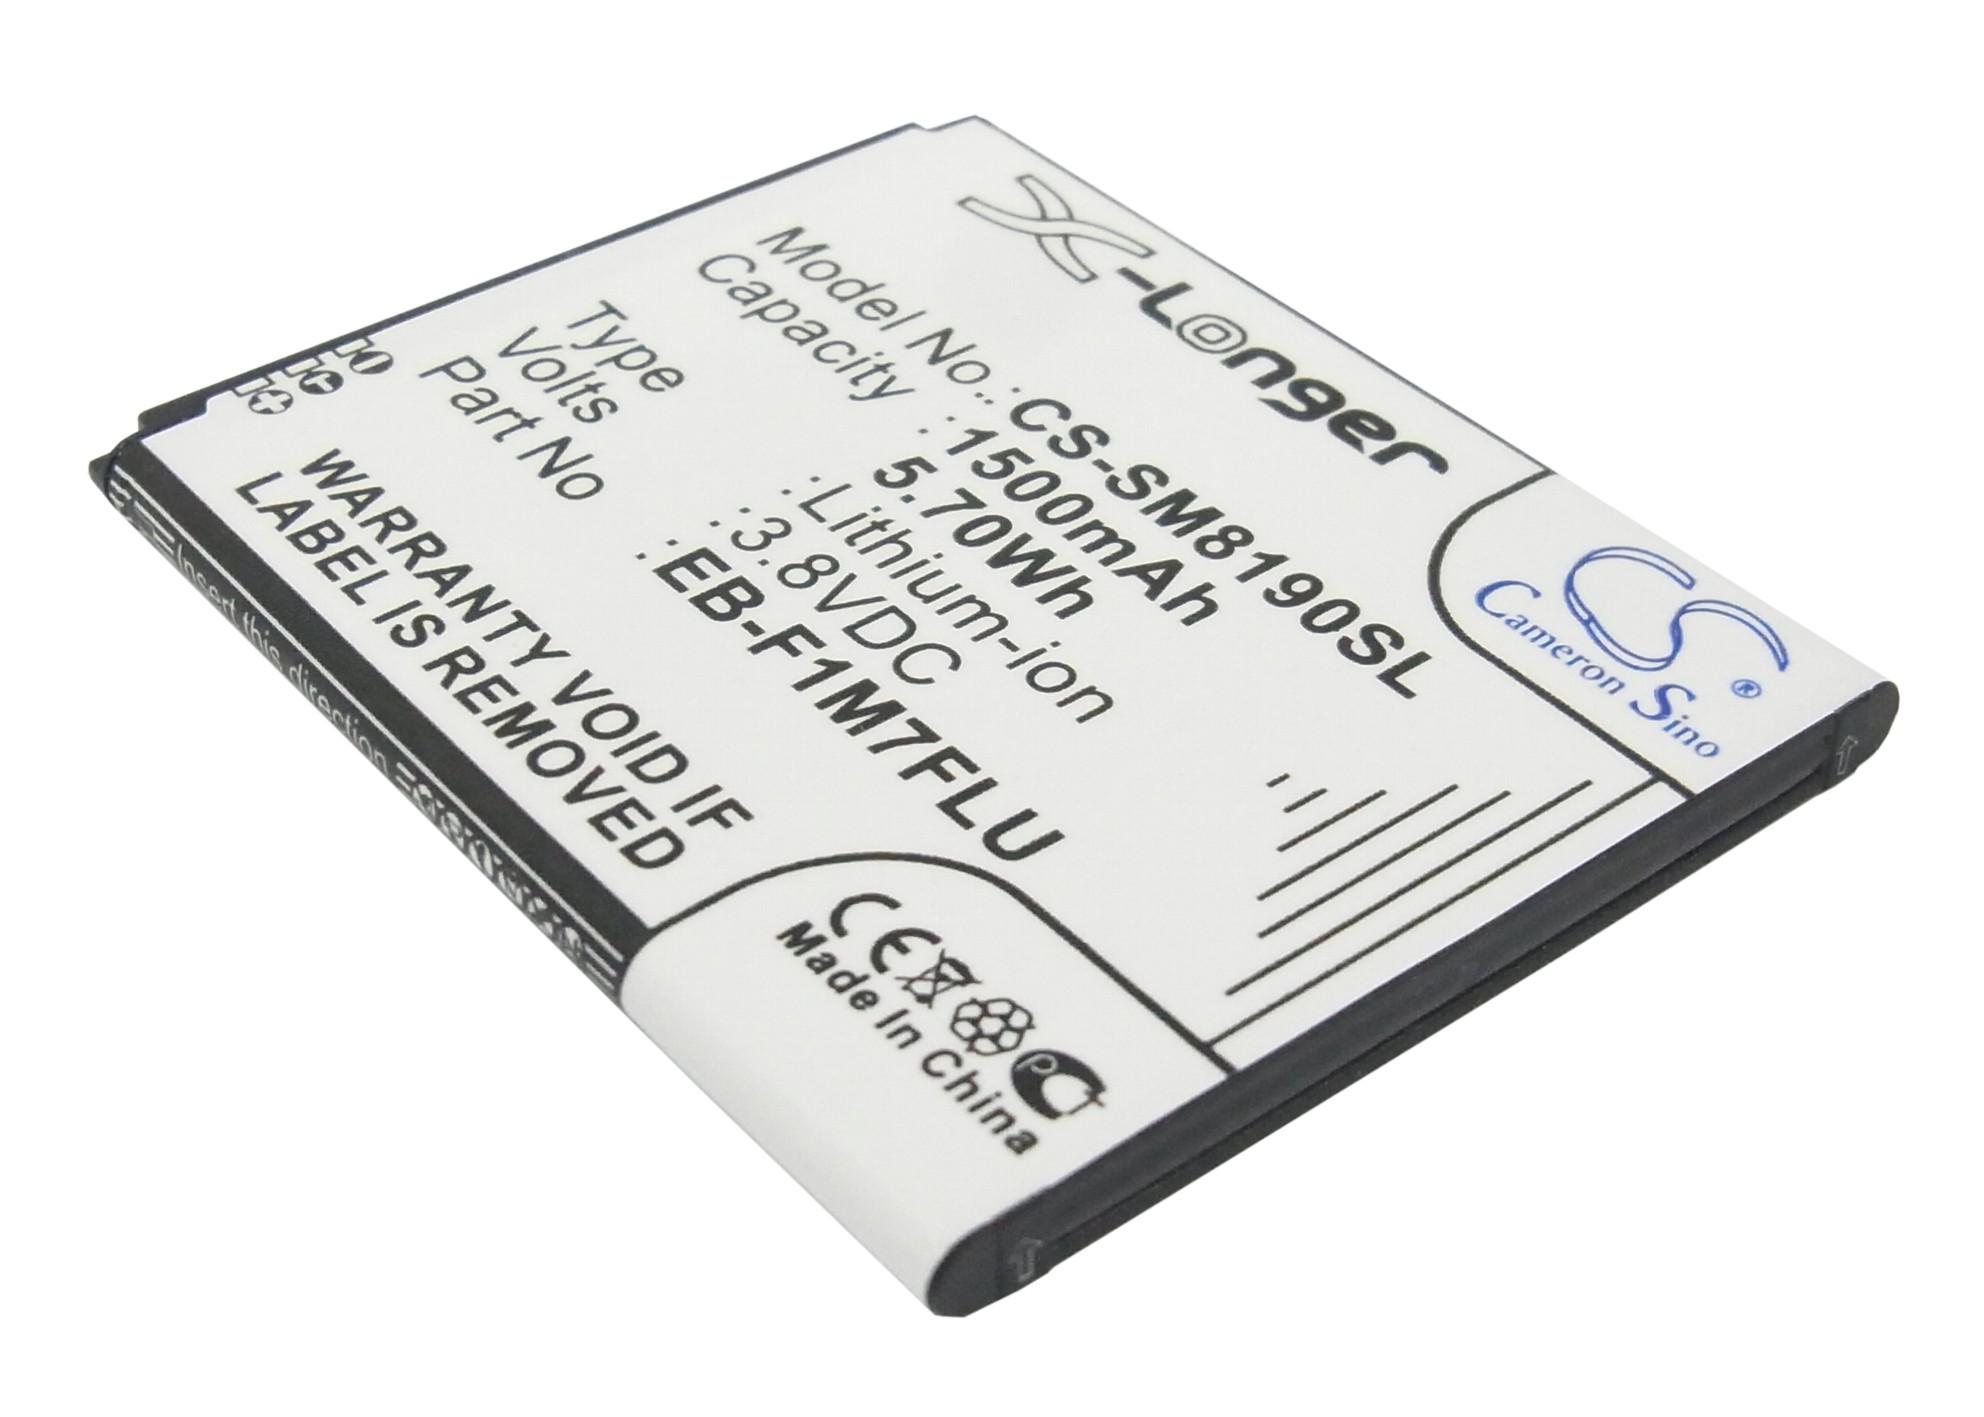 Cameron Sino baterie do mobilů pro SAMSUNG GT-I8200 3.8V Li-ion 1500mAh černá - neoriginální